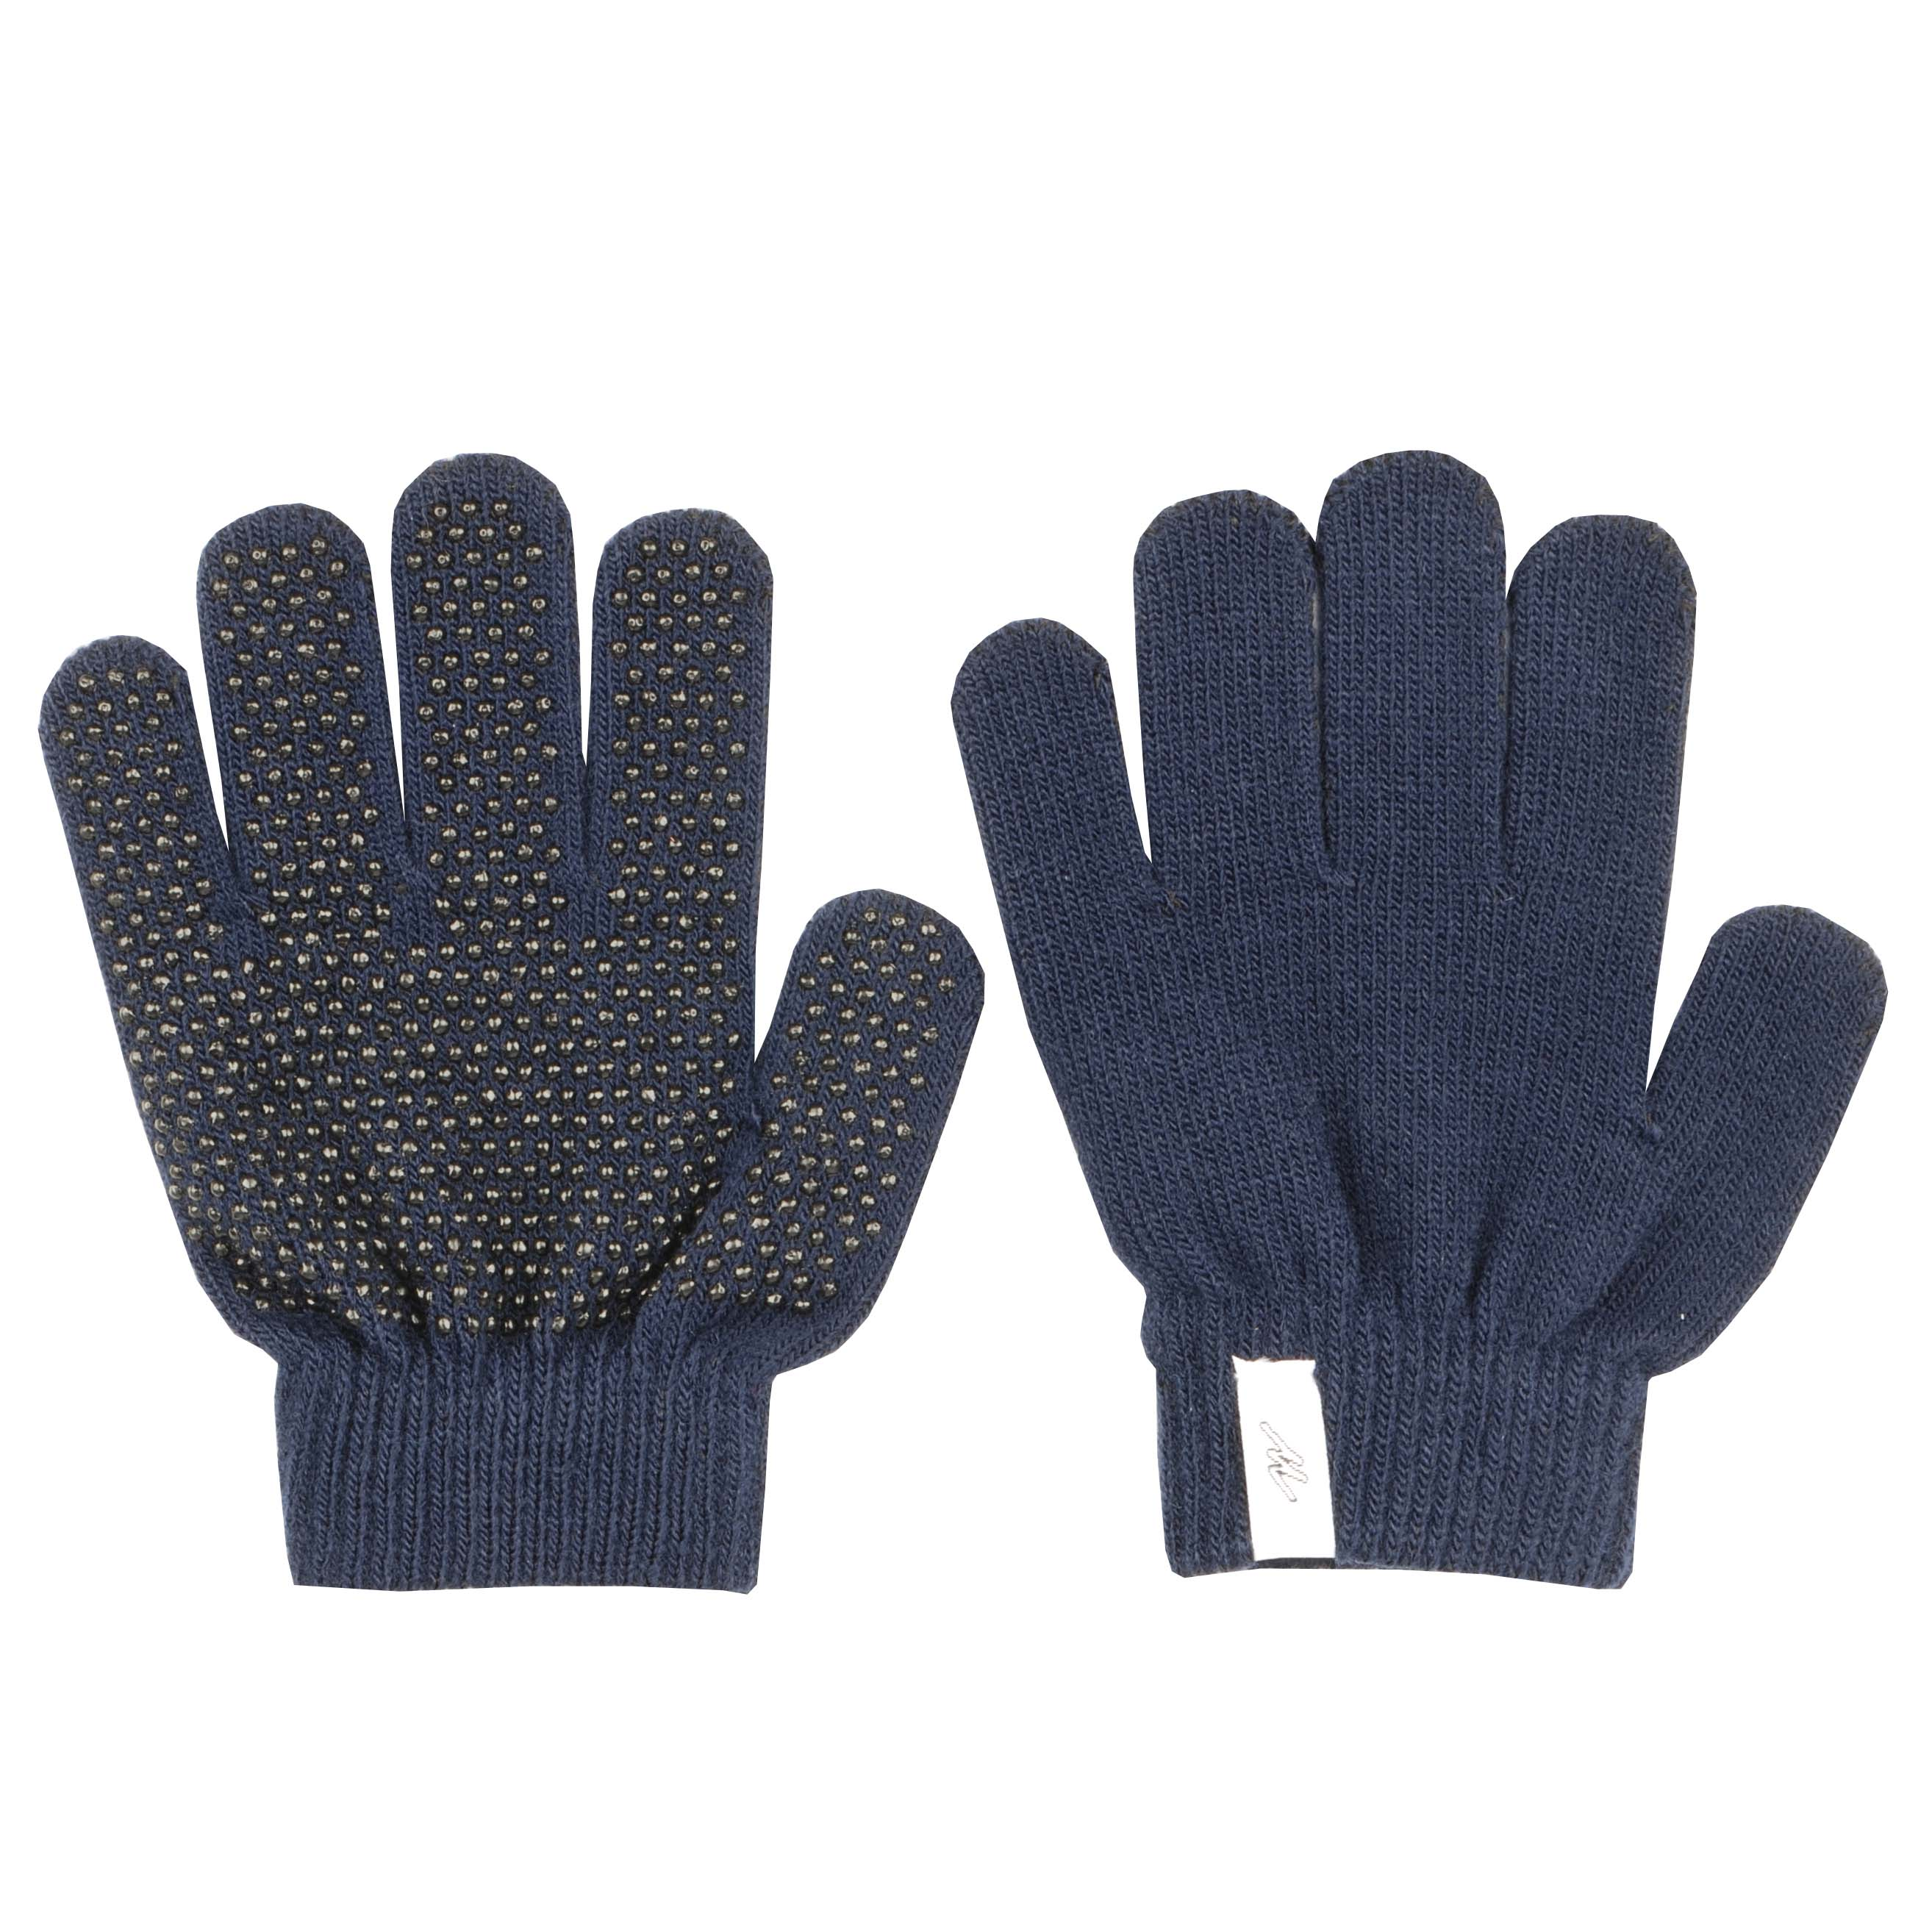 Mondoni Magic Gloves kinder handschoenen donkerblauw